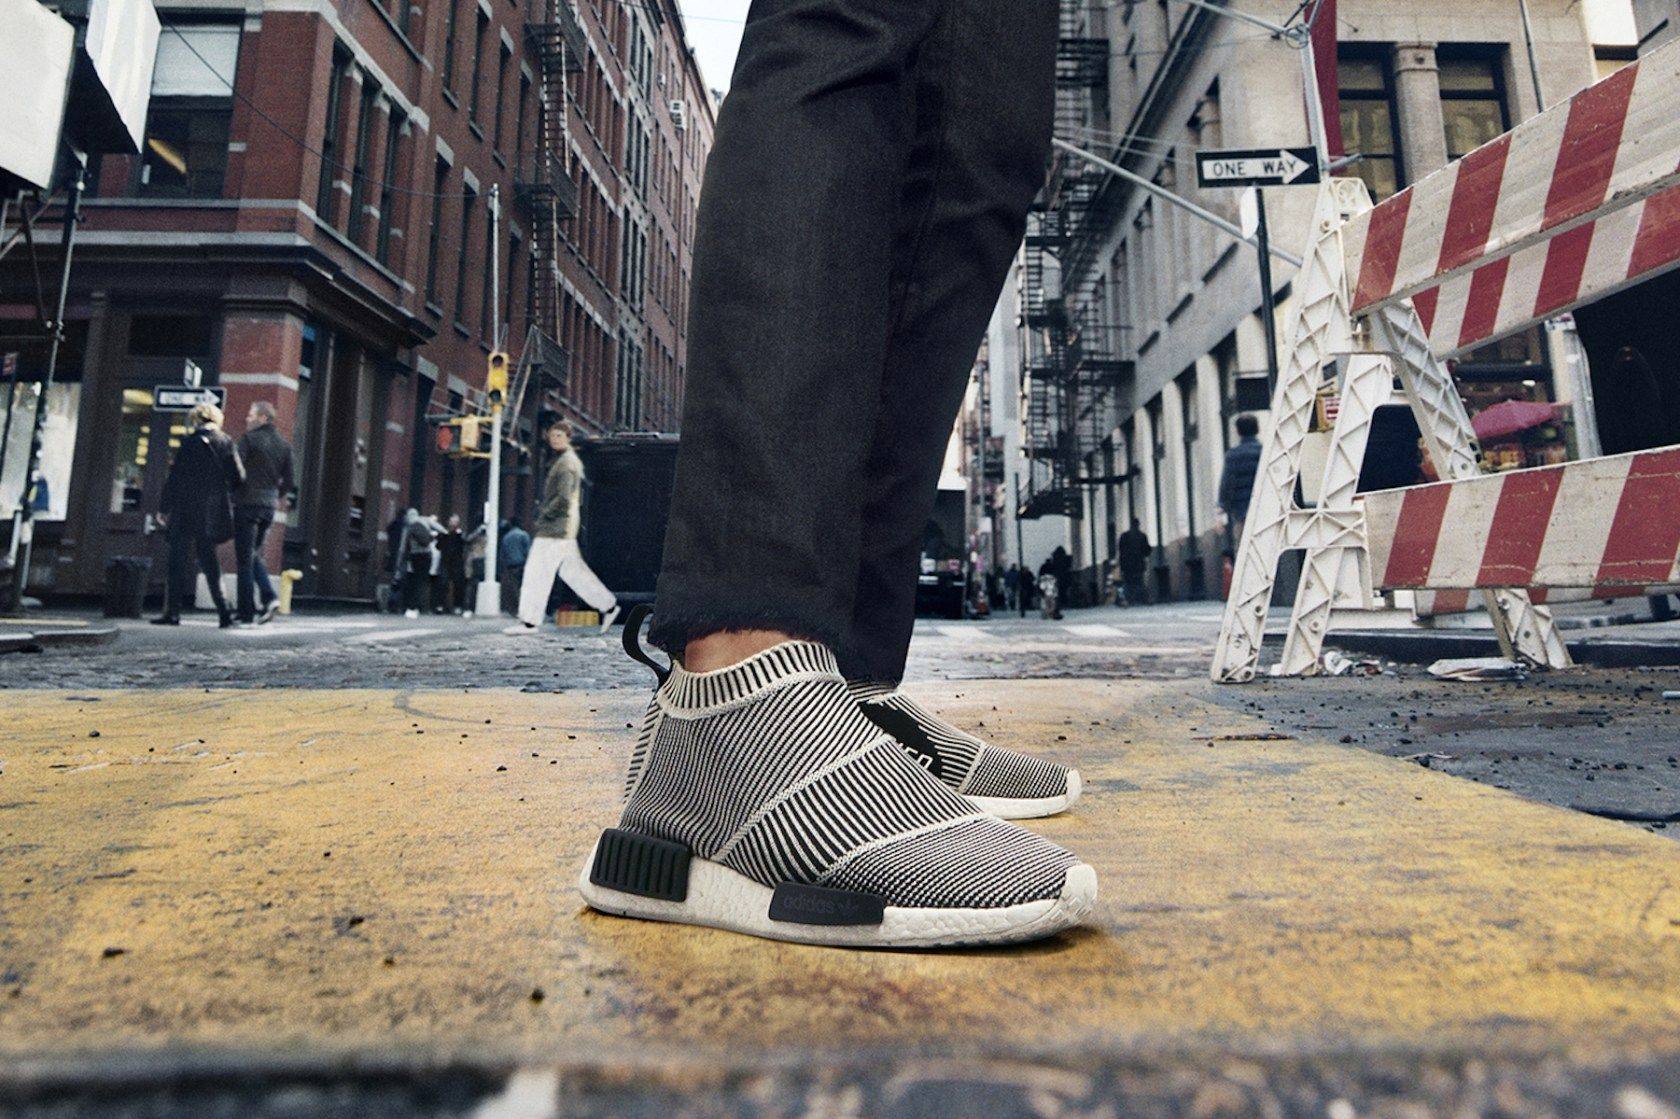 Adidas Originals NMD CS1 City Sock via Sneaker ZimmerMore